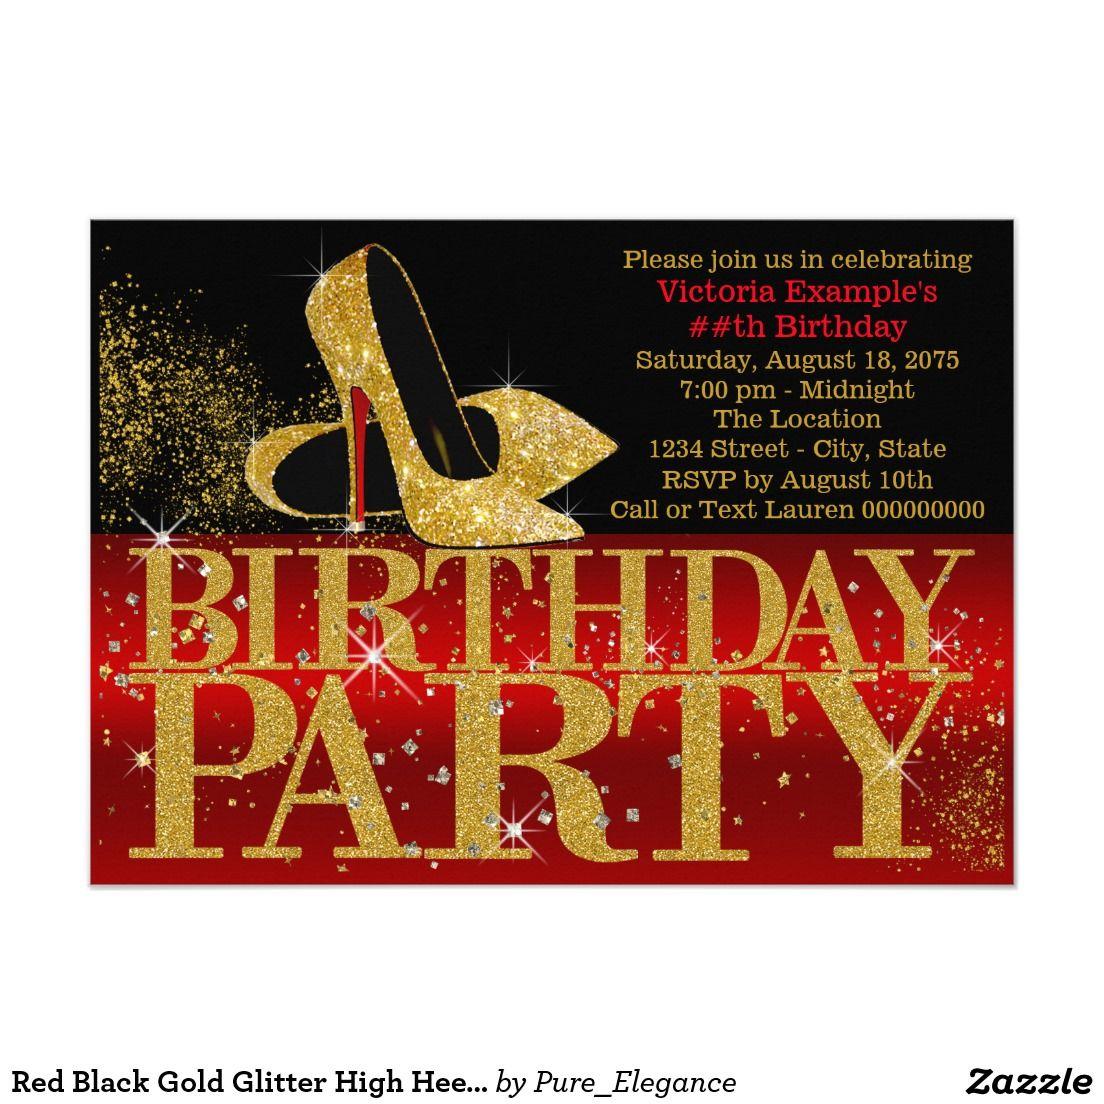 Red Black Gold Glitter High Heel Birthday Party 4.5x6.25 Paper ...